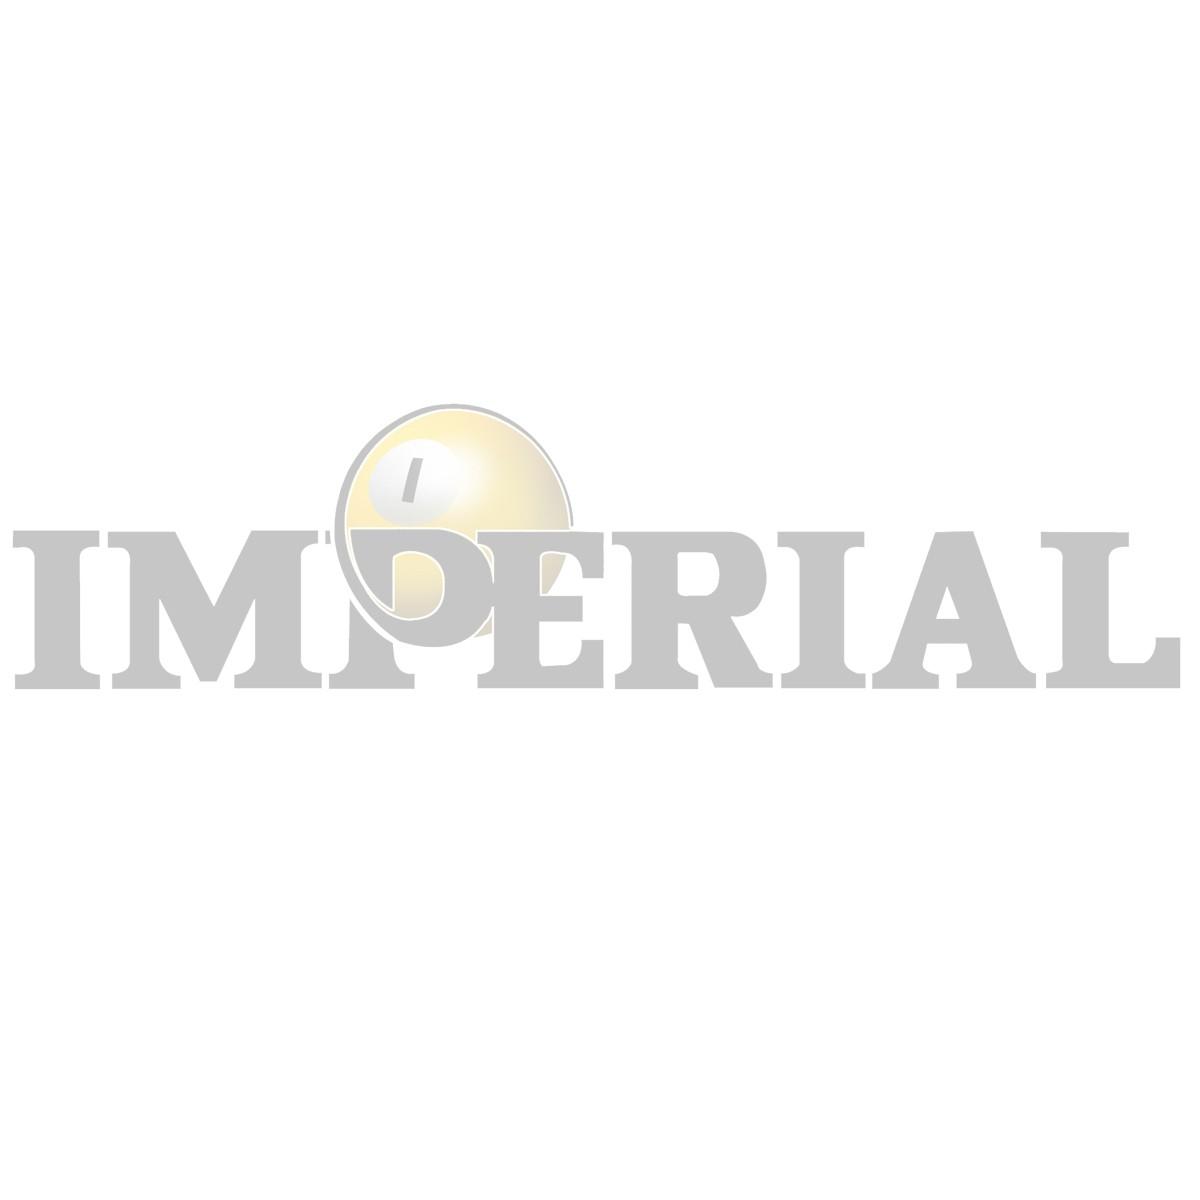 Ohio State Home vs. Away Billiard Ball Set